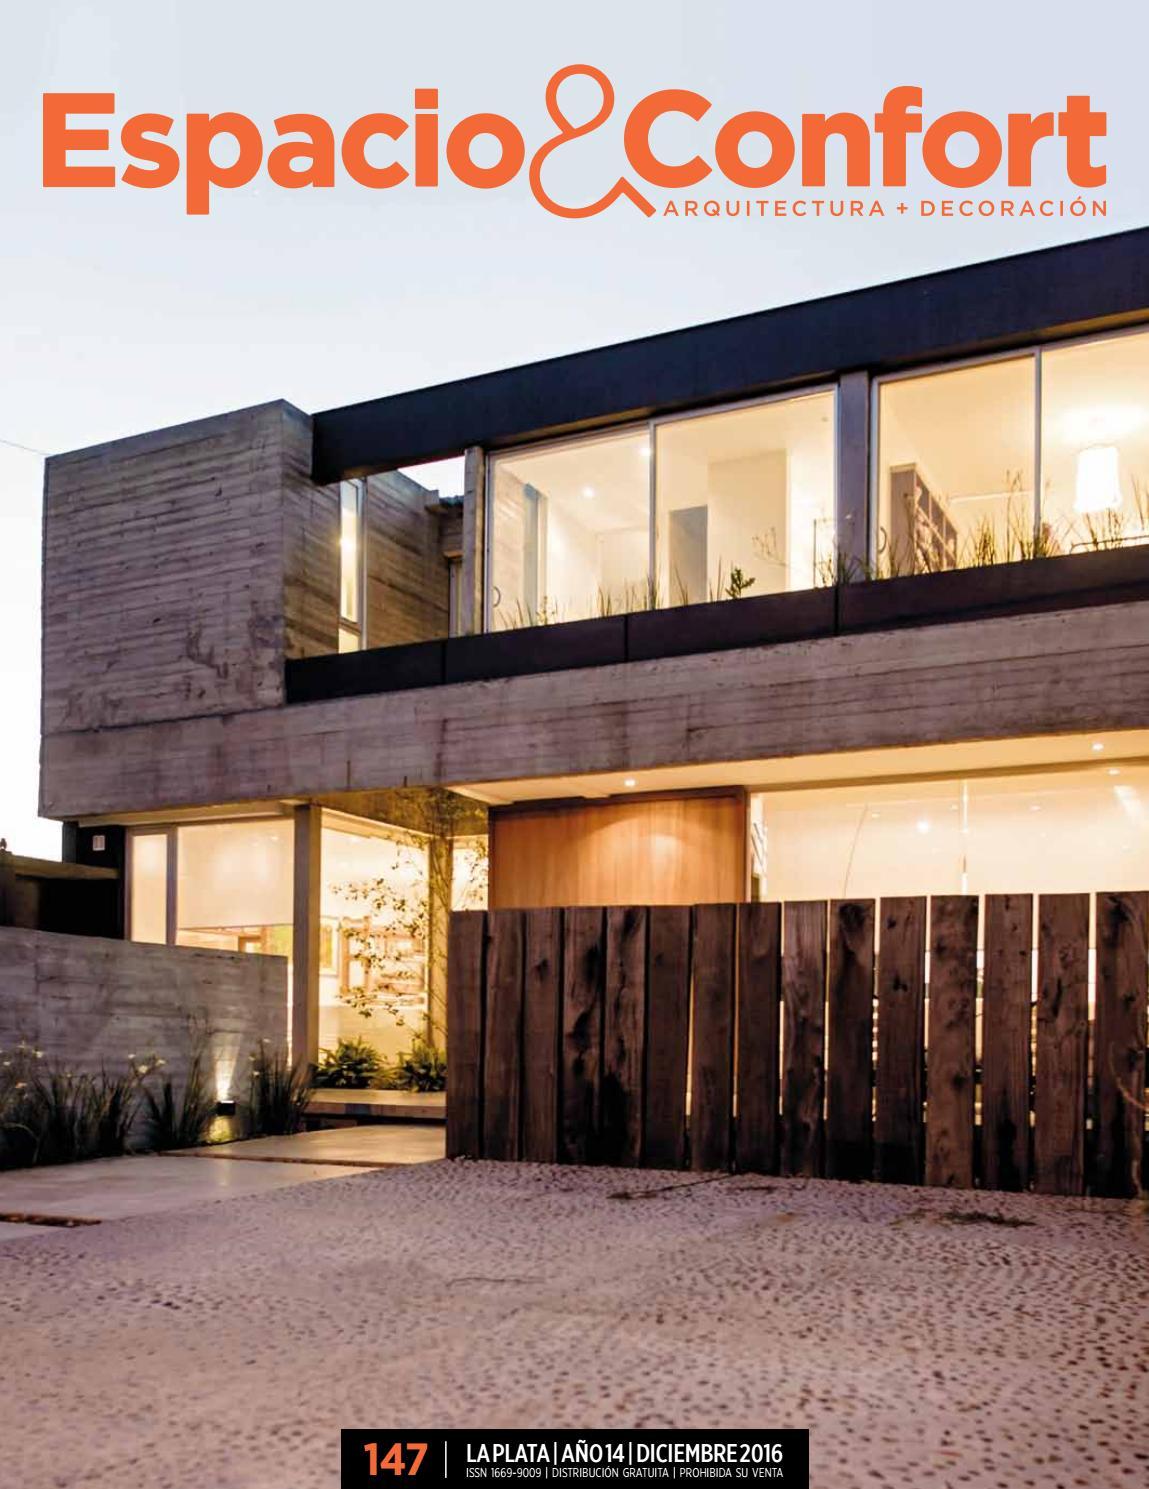 147 la plata diciembre 2016 by revista espacio confort for Estudios de arquitectura la plata